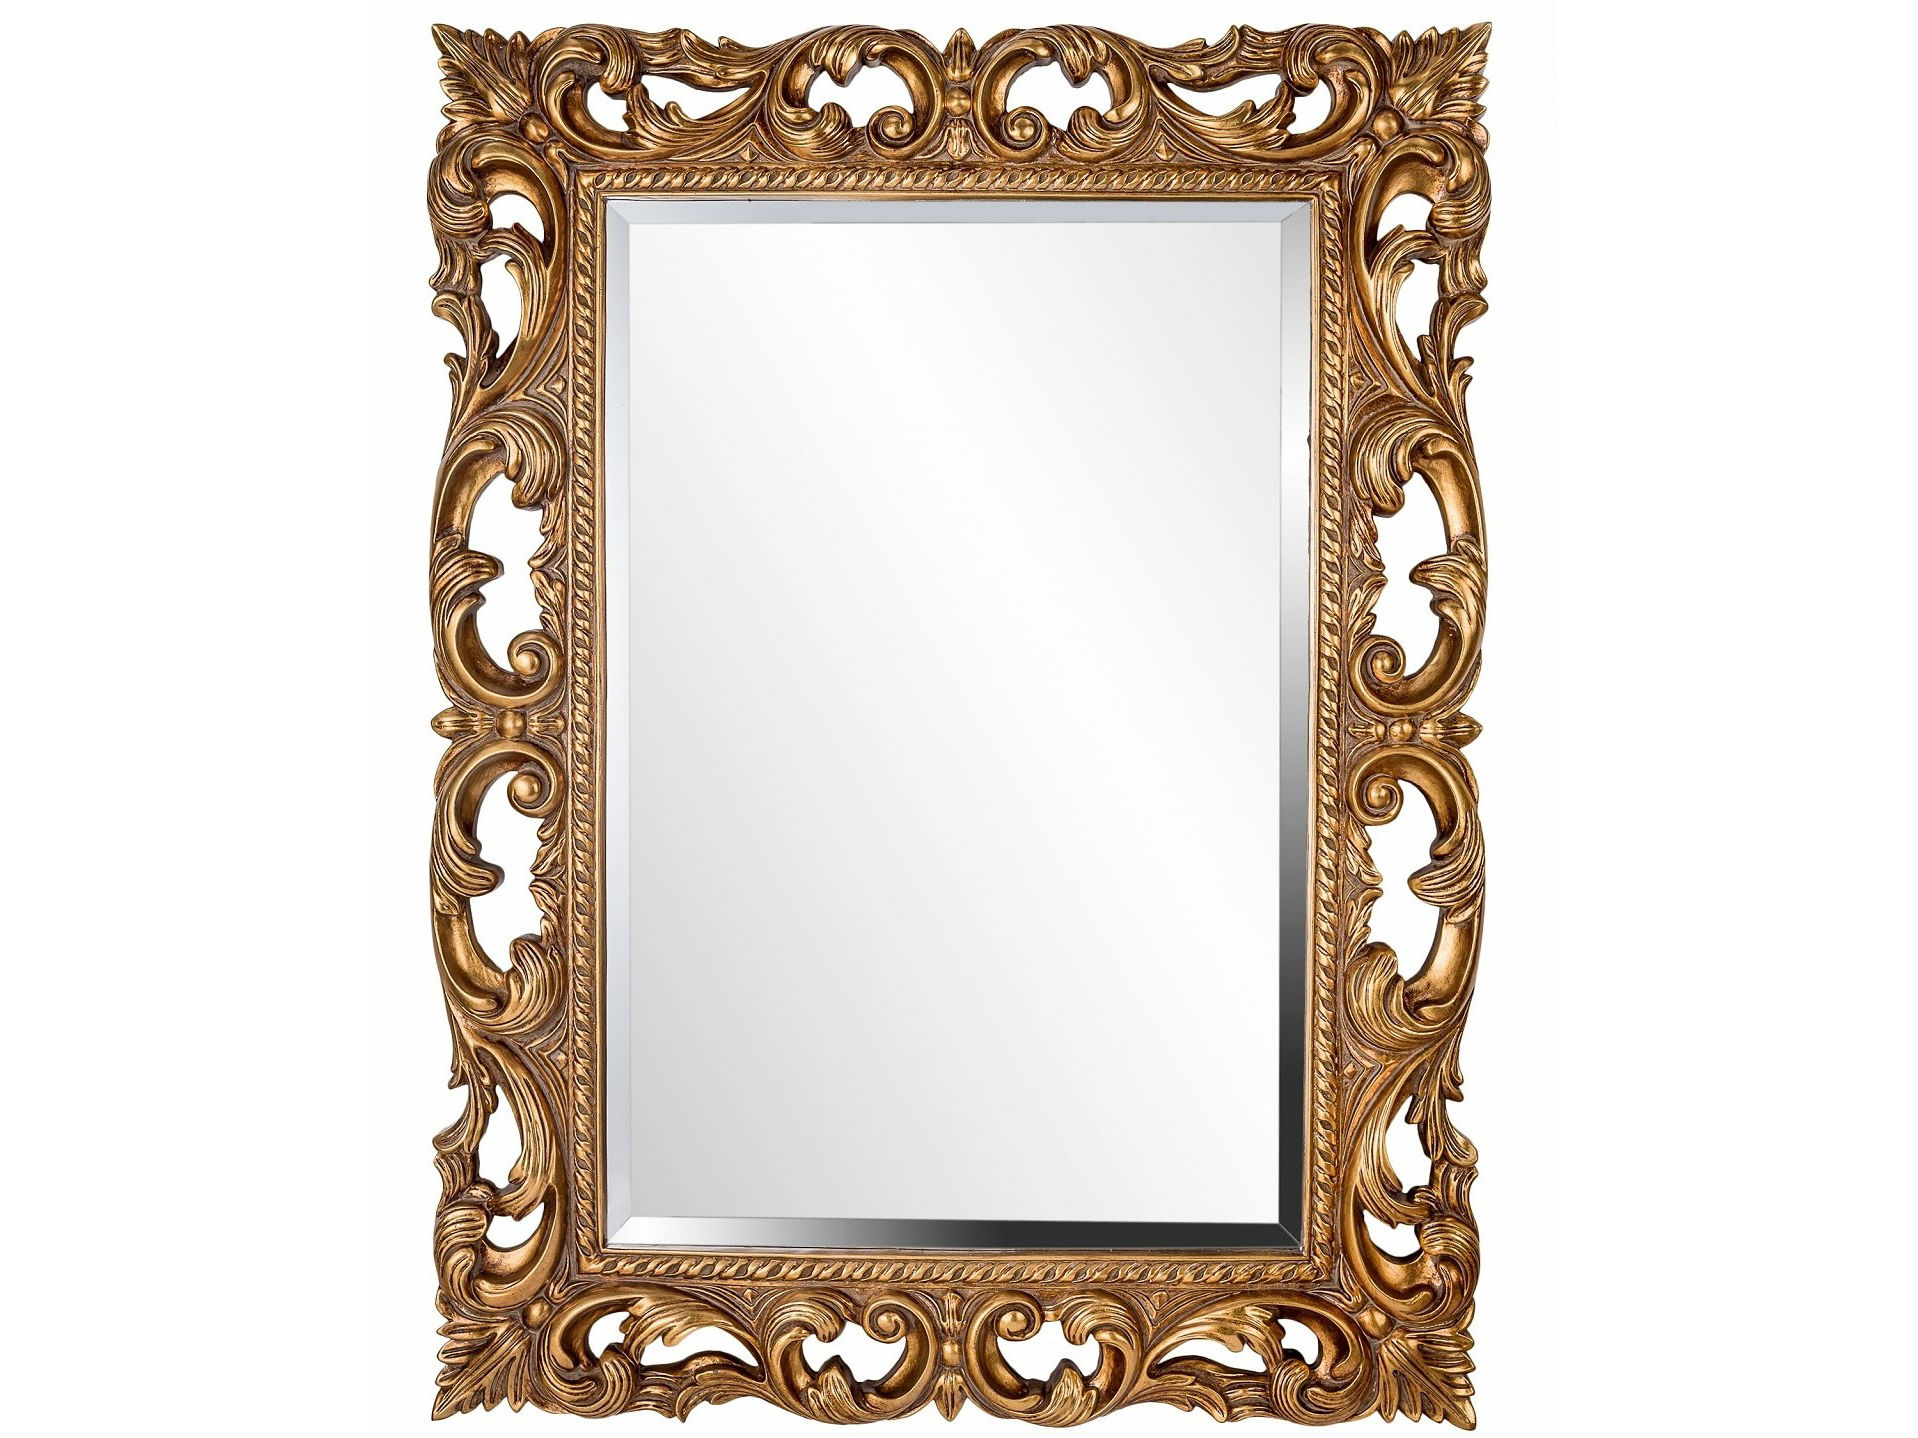 Зеркало Oxford GoldНастенные зеркала<br>Цвет: античное золото<br><br>Material: Пластик<br>Length см: None<br>Width см: 90.0<br>Depth см: None<br>Height см: 120.0<br>Diameter см: None